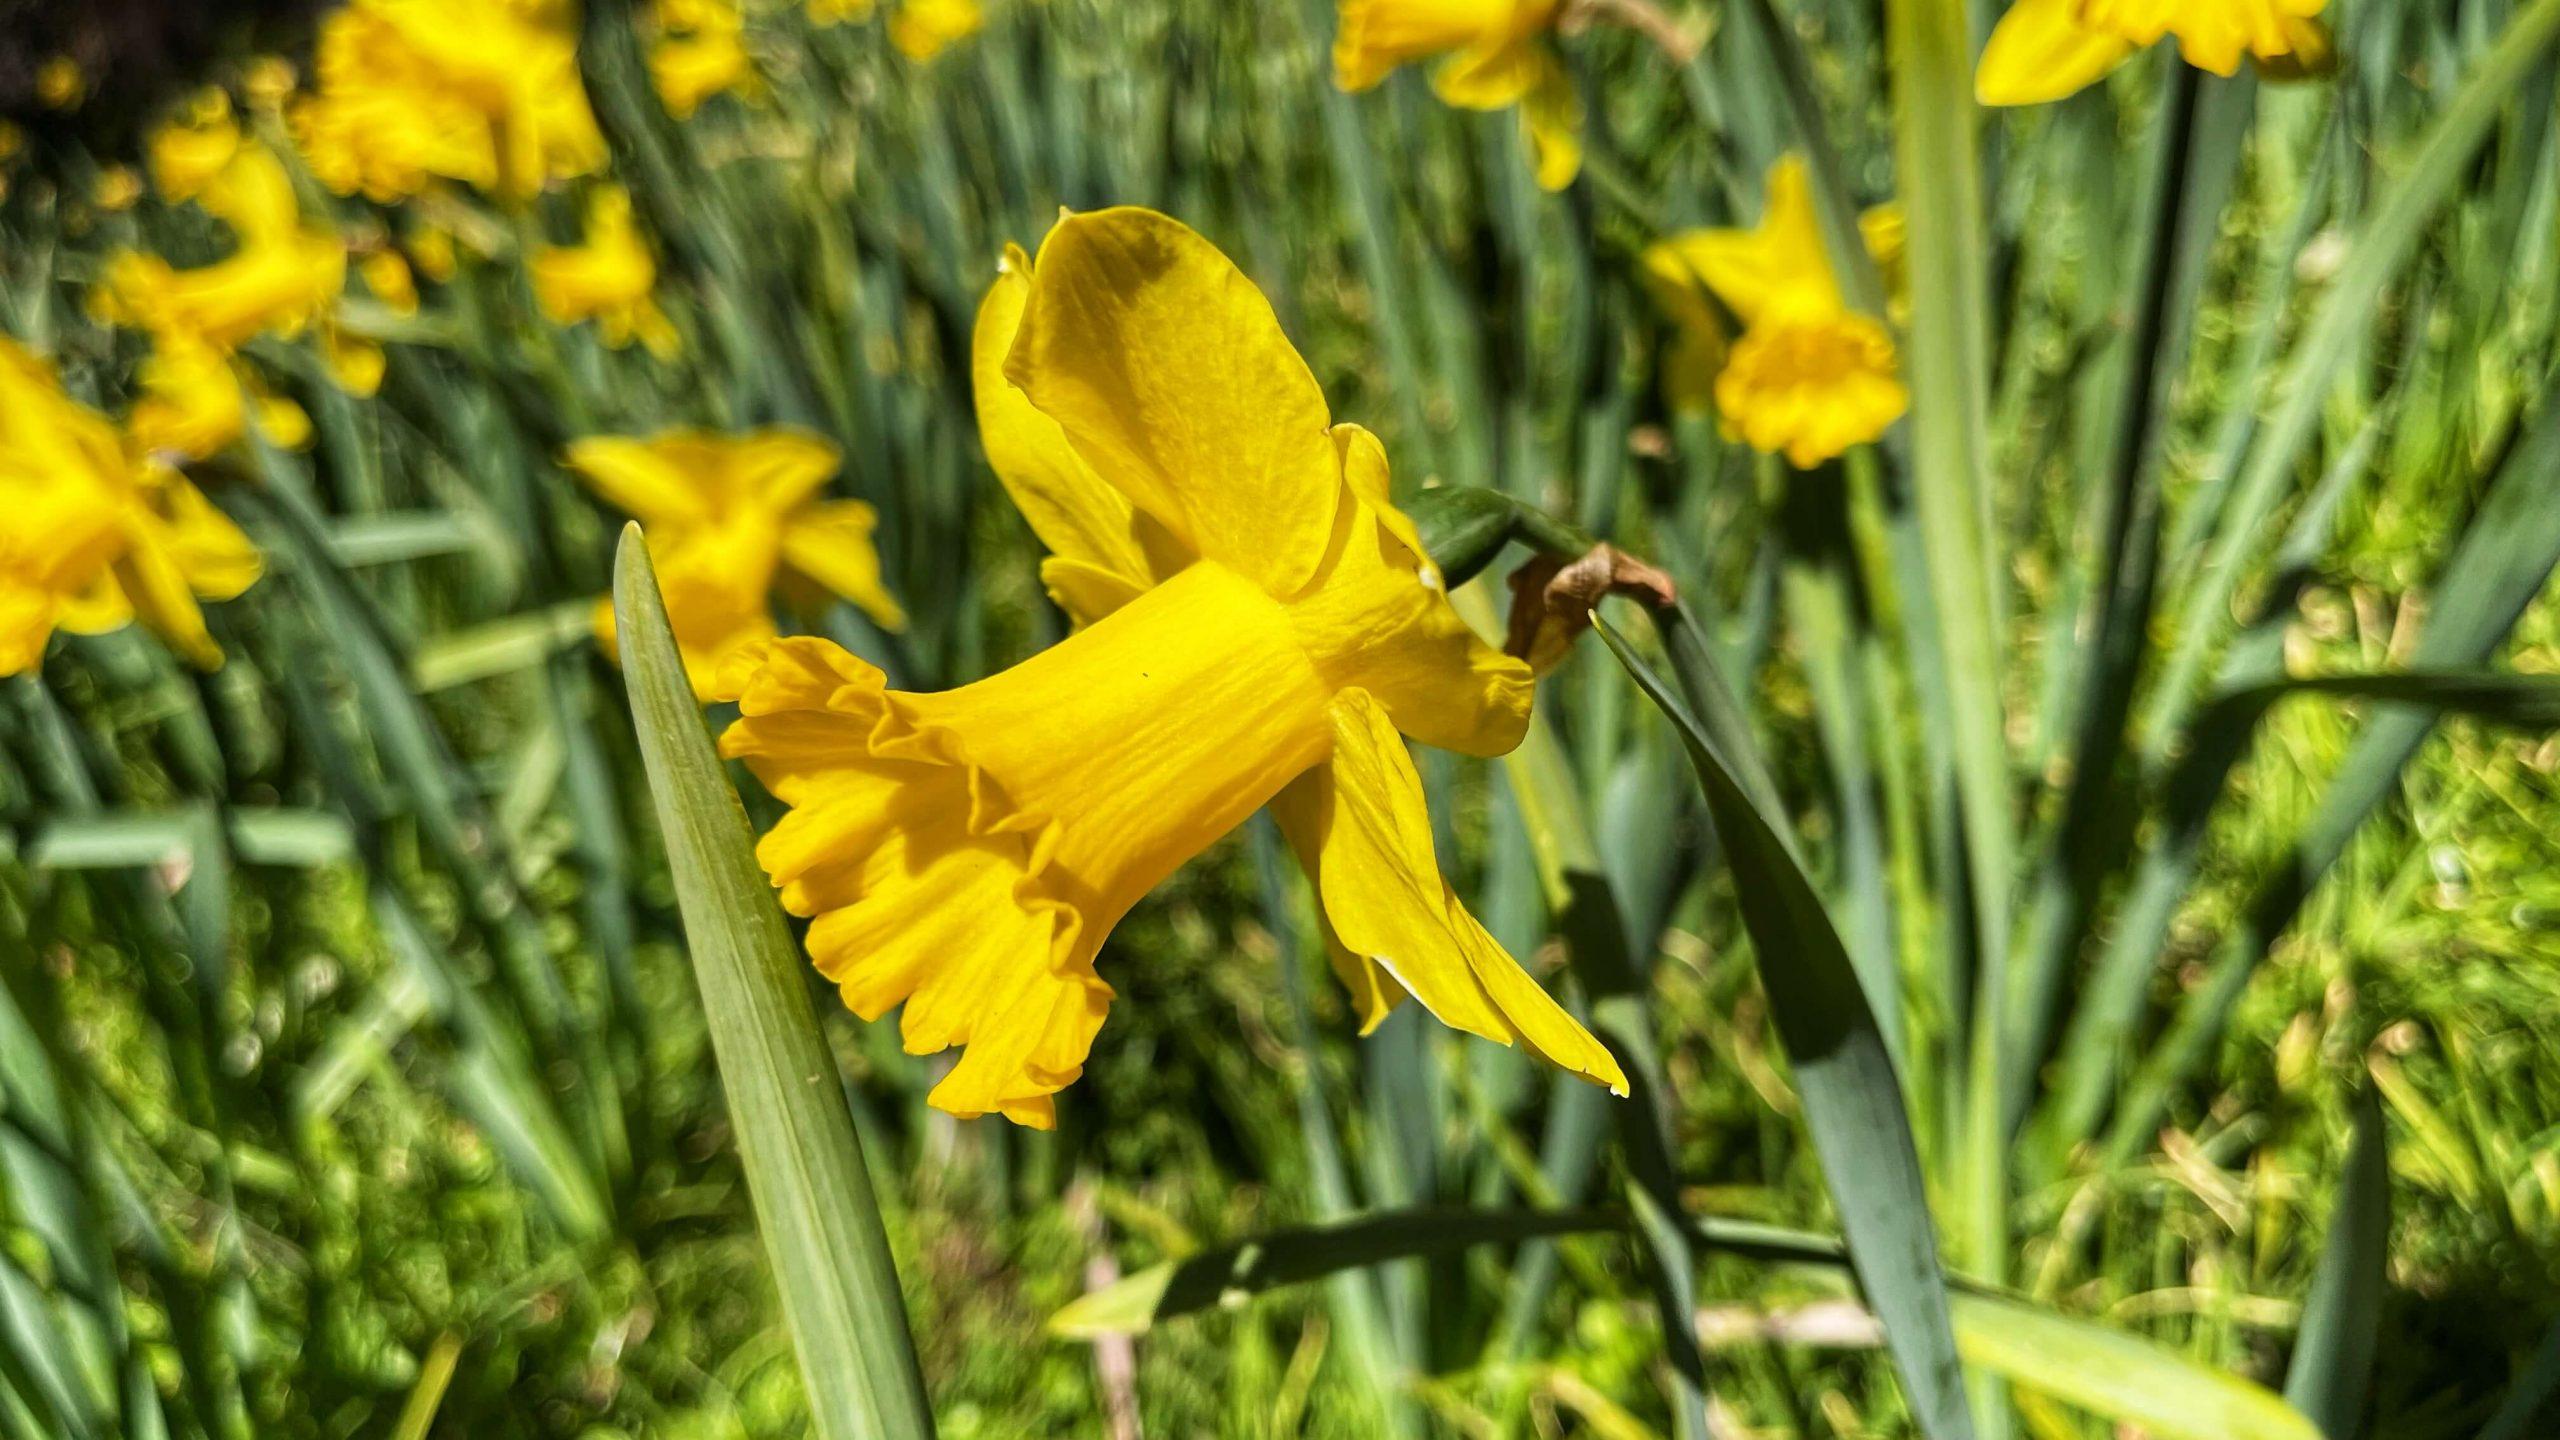 Daffodils at Blue Mountains Botanic Gardens